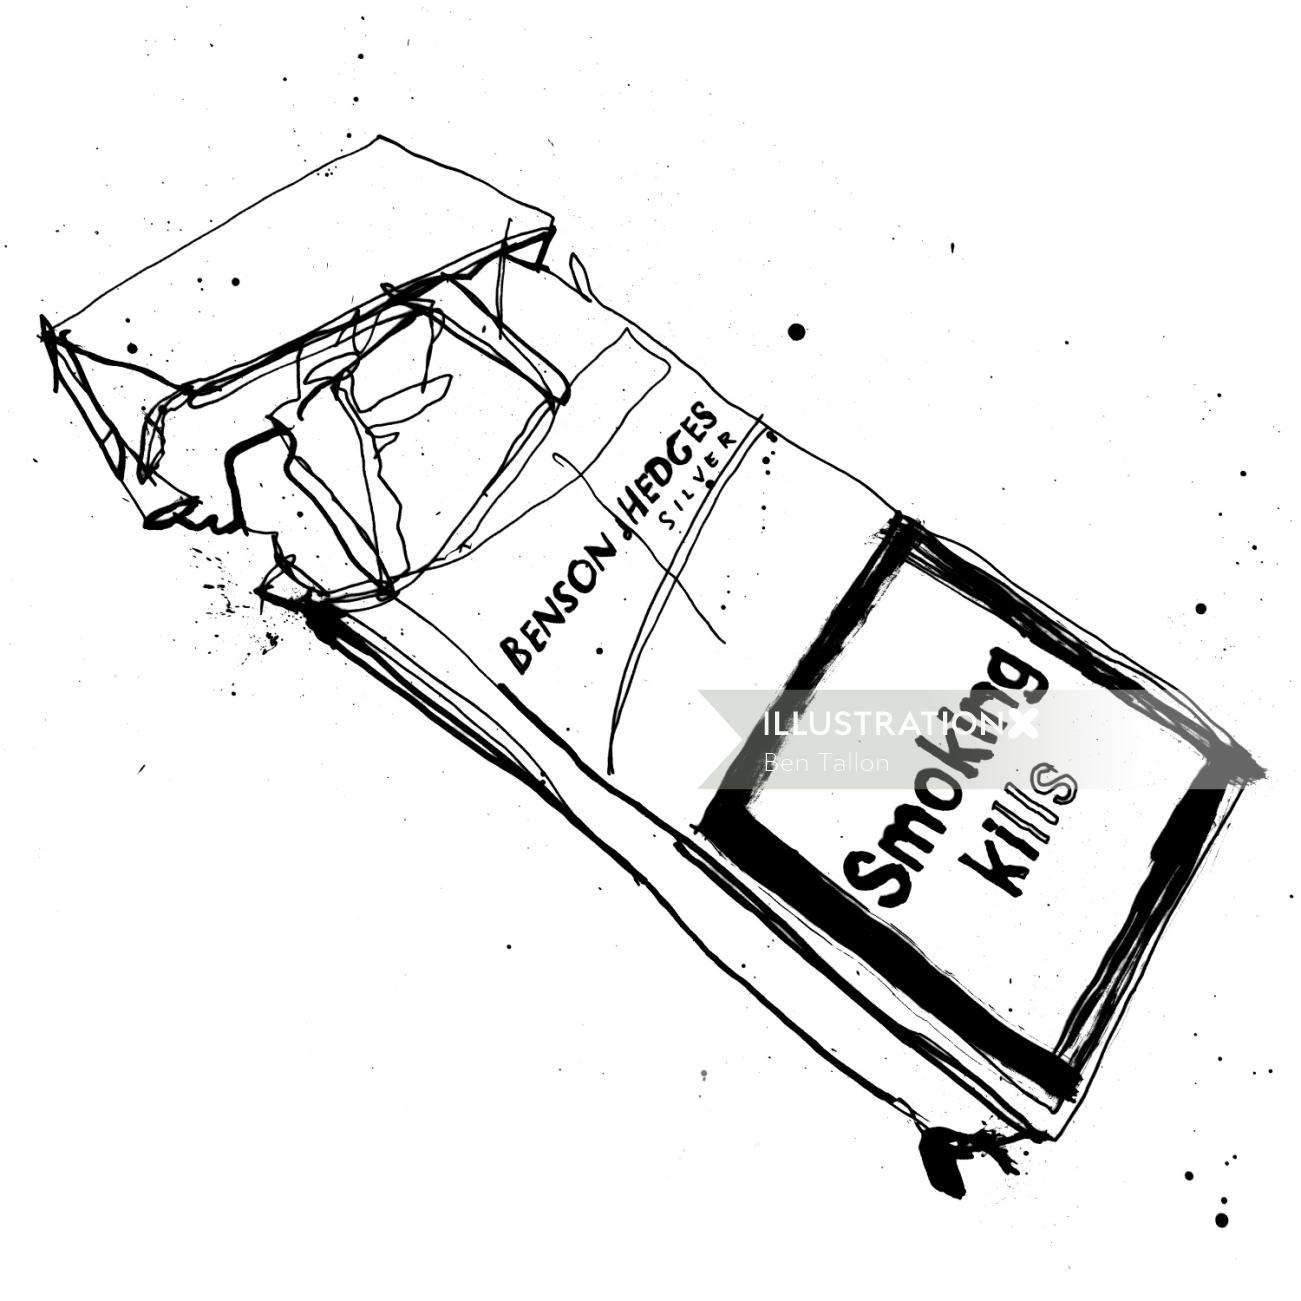 Conceptual illustration of smoking killsby Ben Tallon